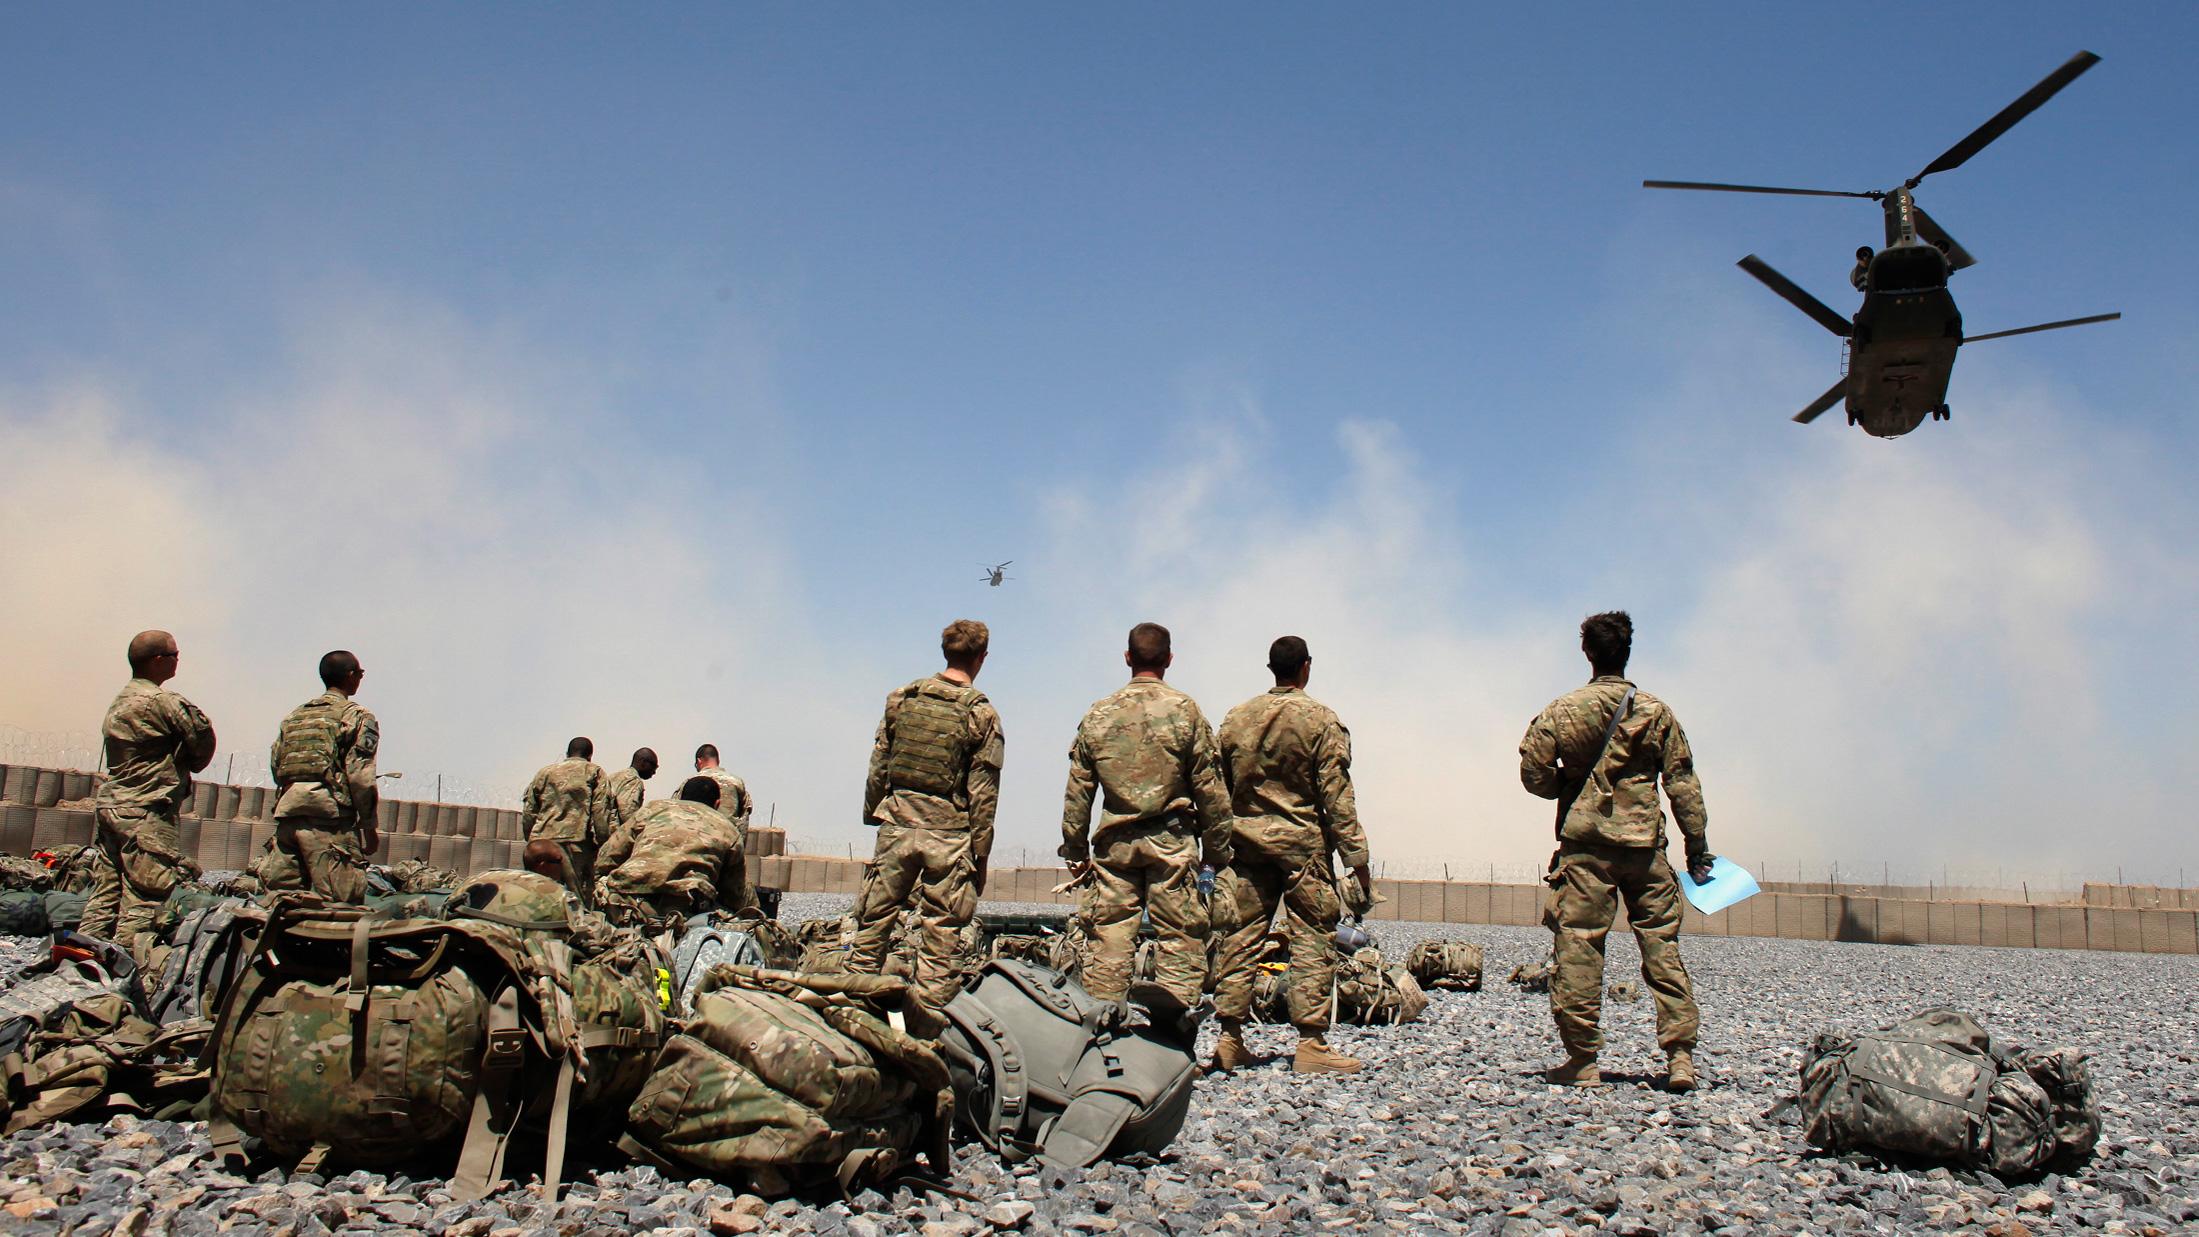 USA Troops in Afghanistan